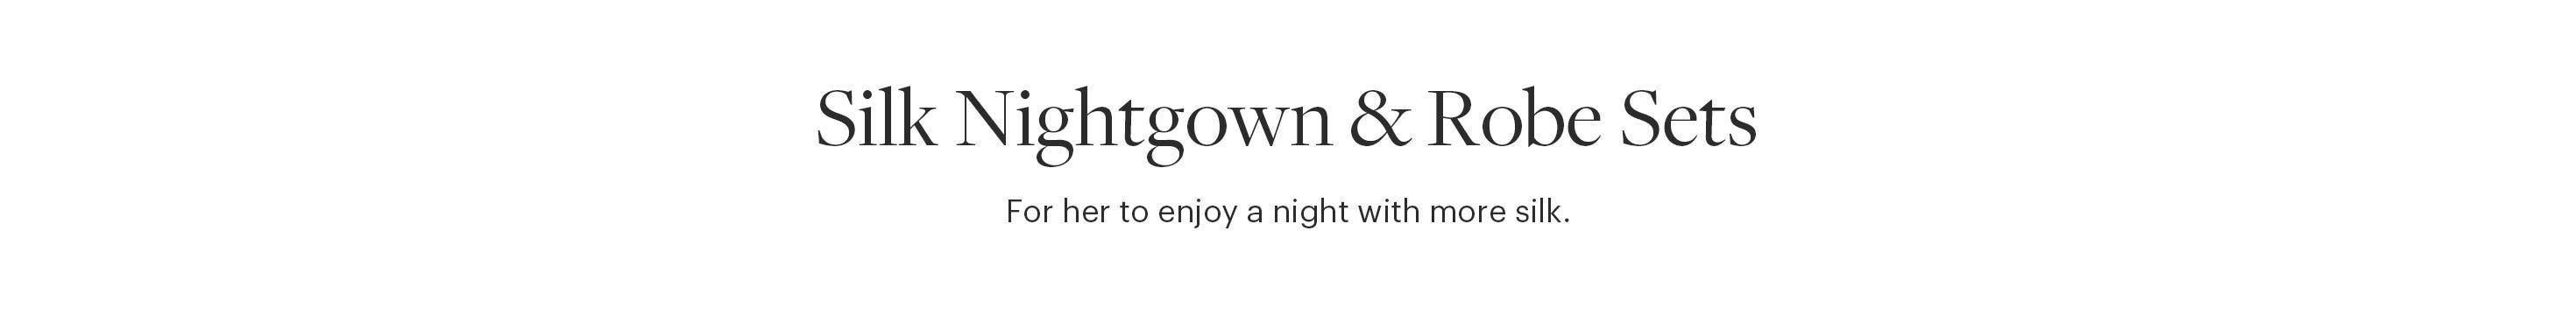 Silk Nightgown & Robe Set